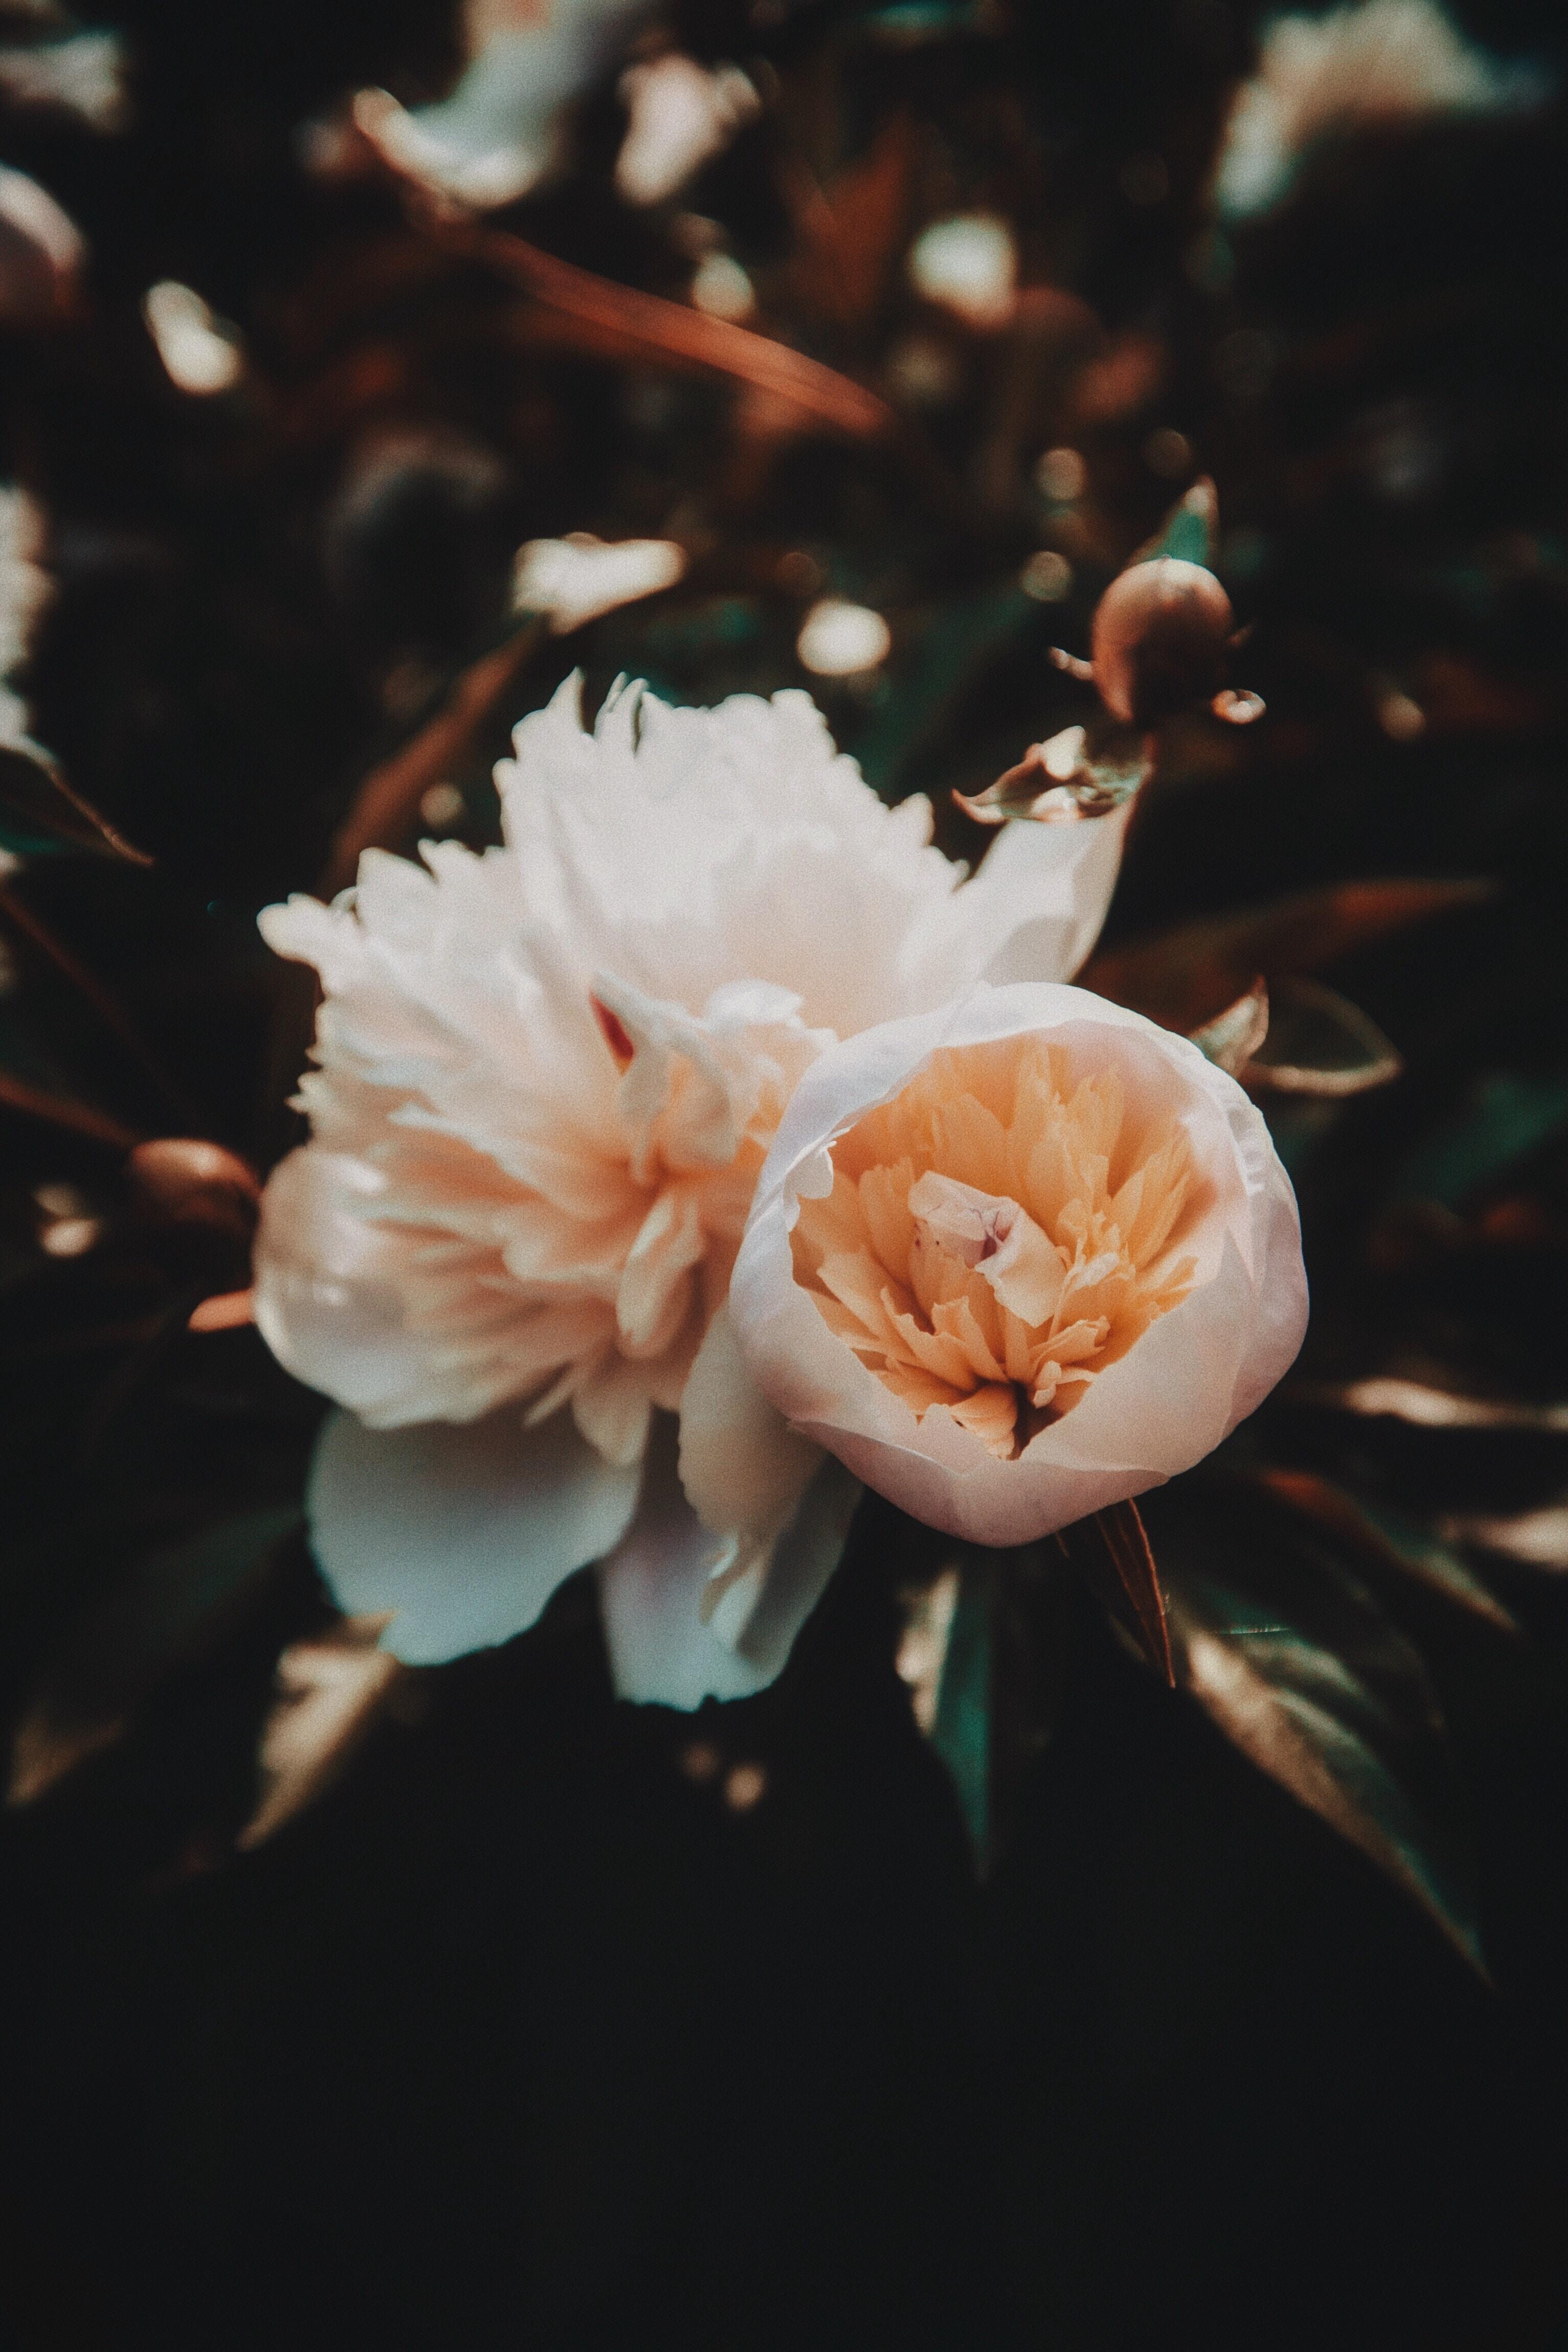 white and orange petaled flower